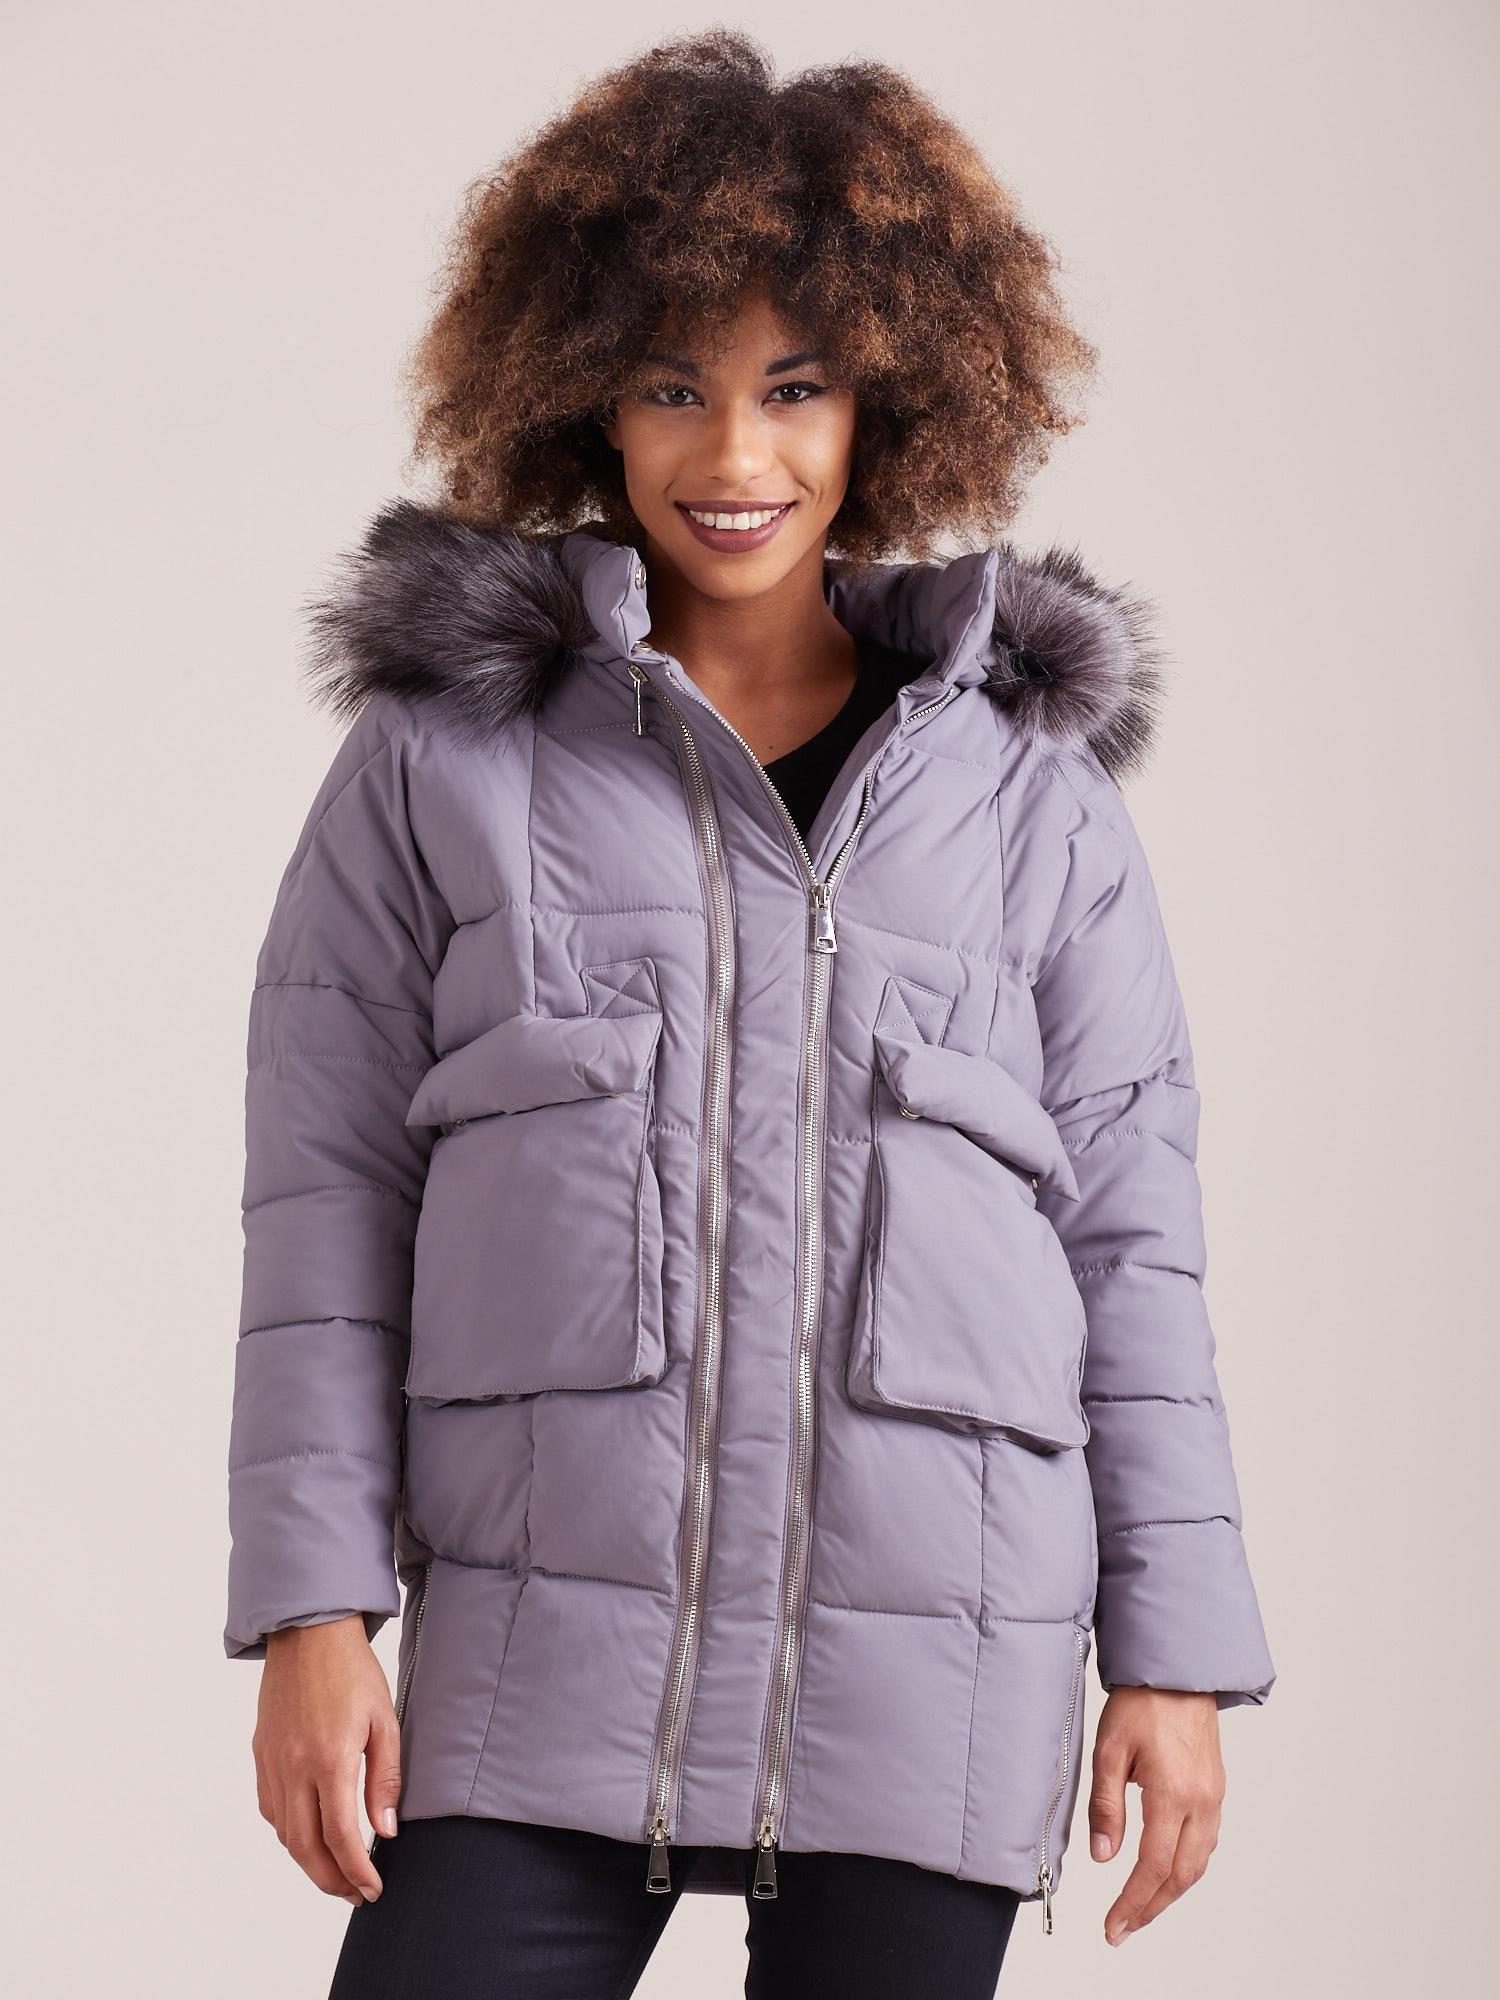 Dámska zimná bunda sivá S